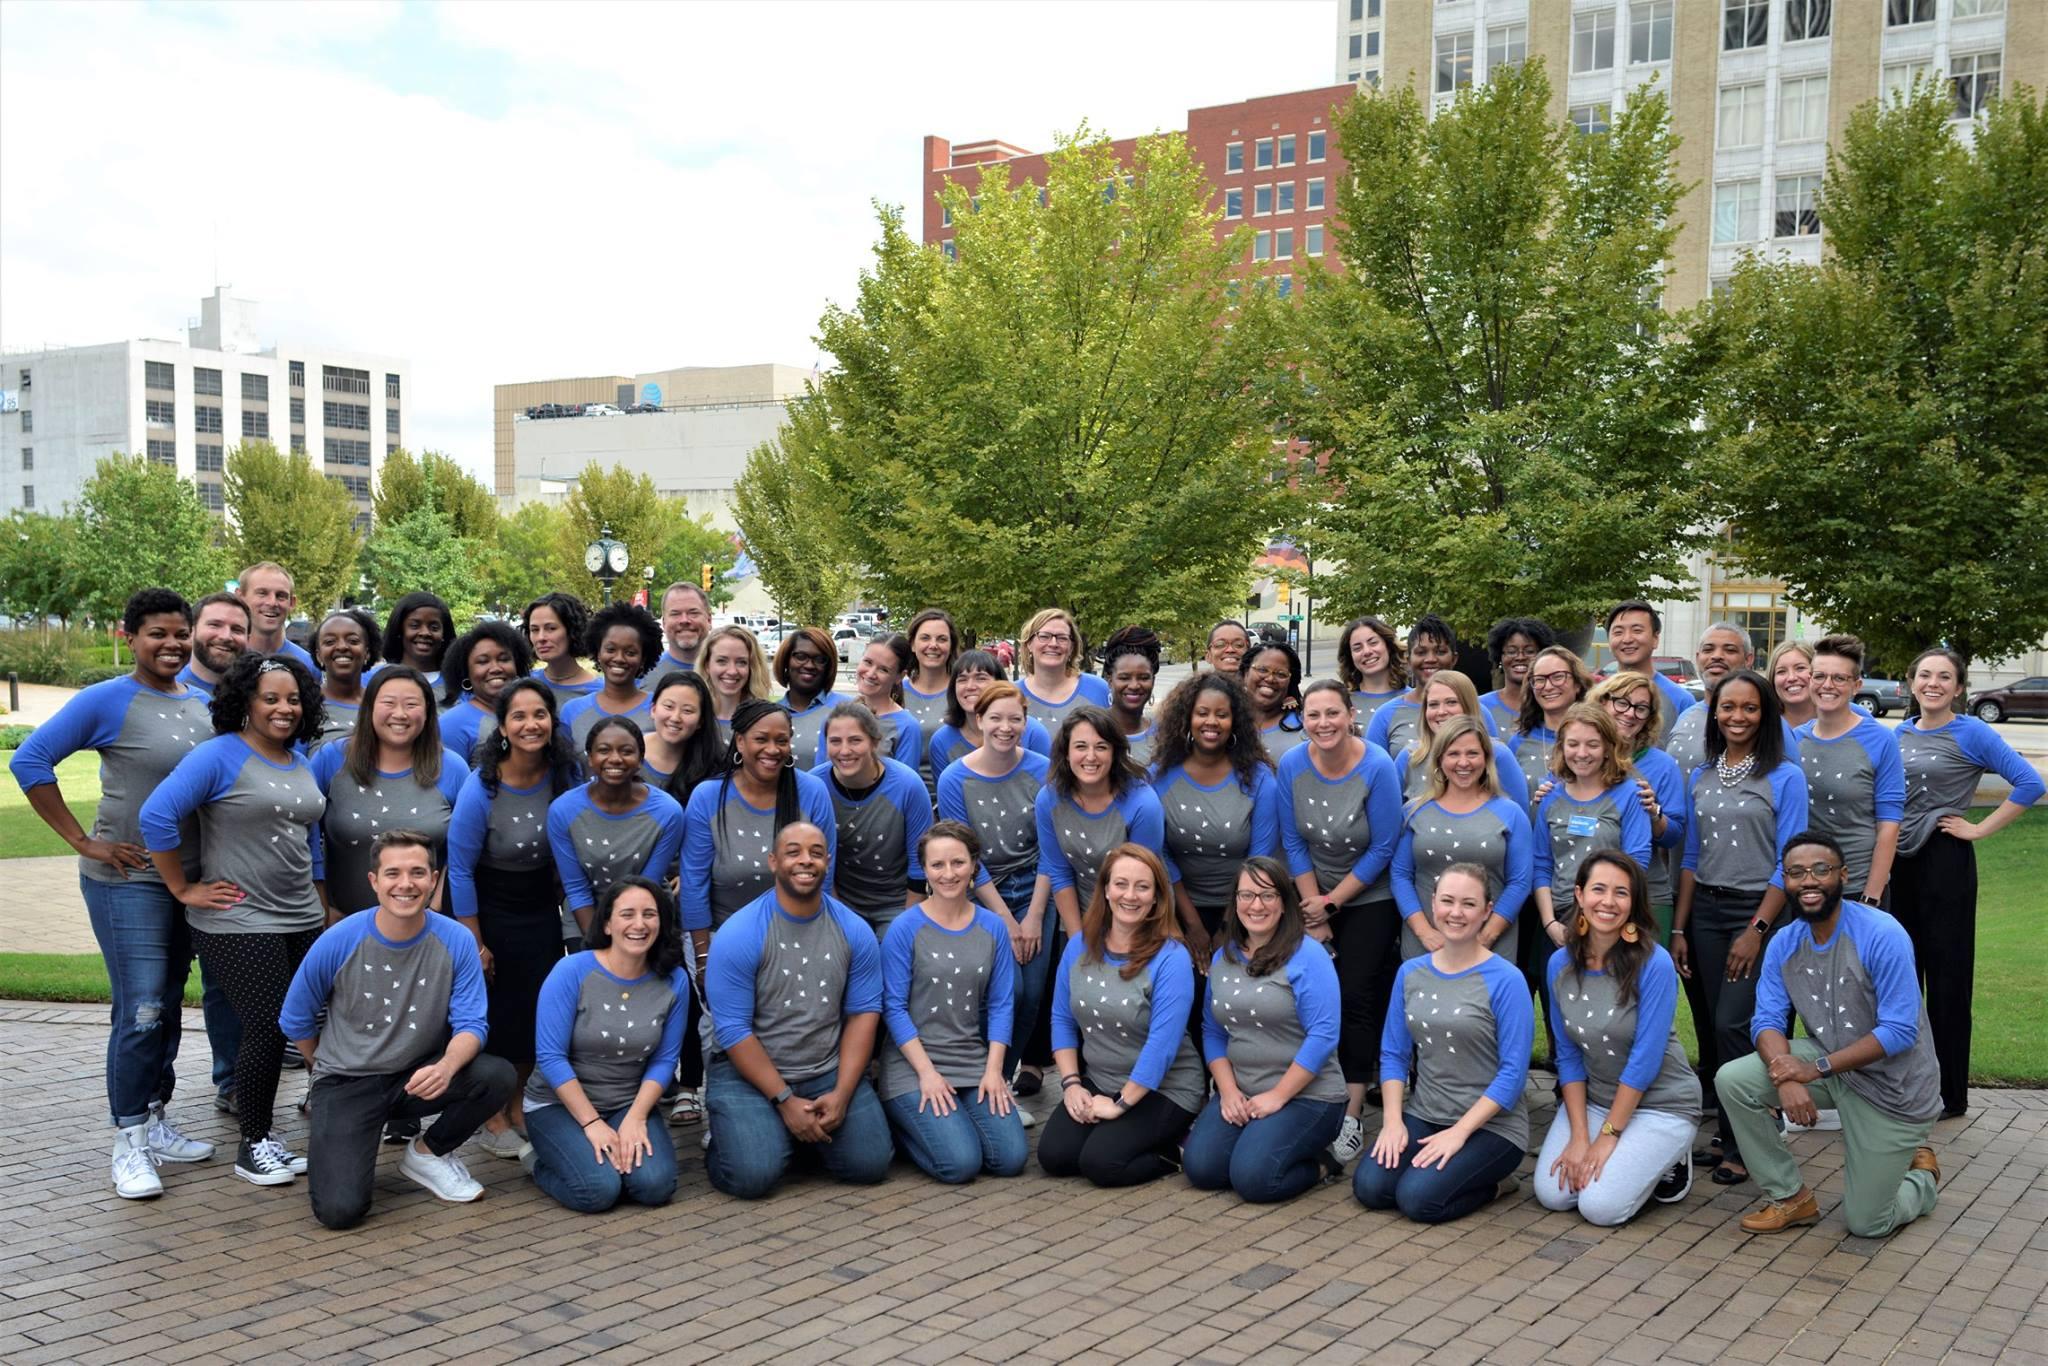 Leading Educators team wearing newly branded tshirts